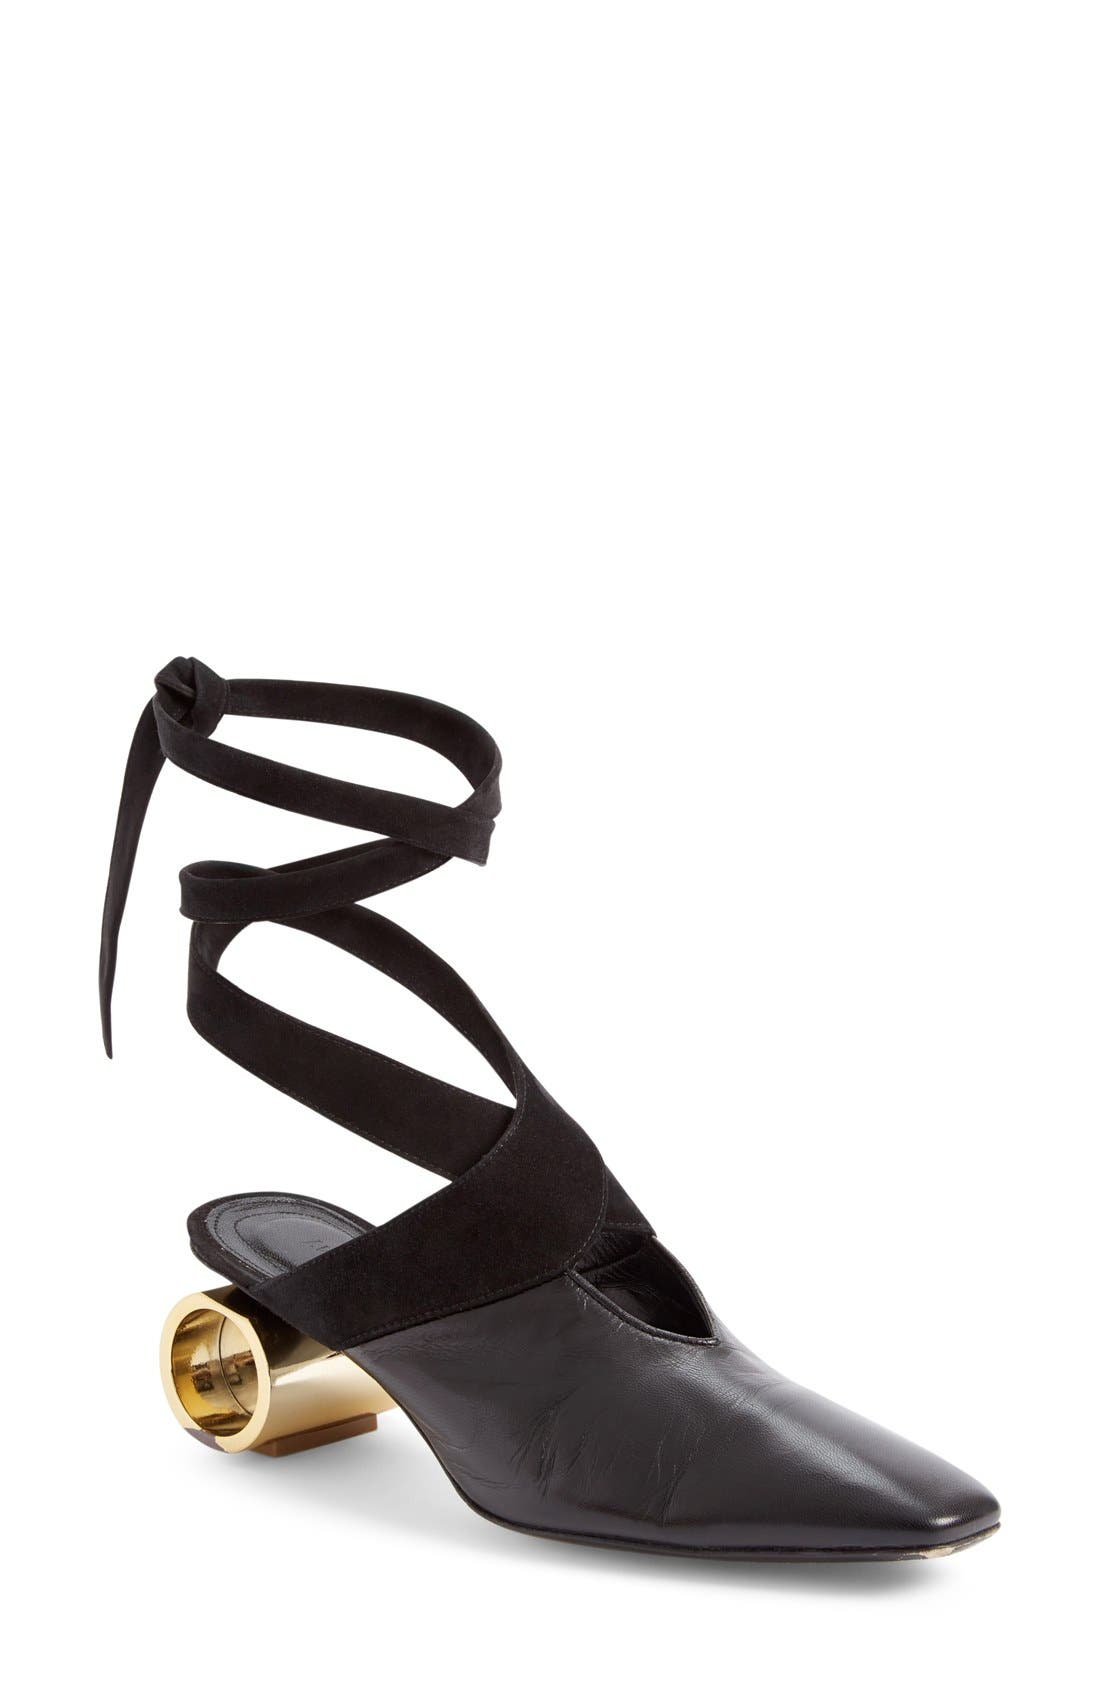 J.W.ANDERSON Cylinder Heel Ballet Slide (Women)